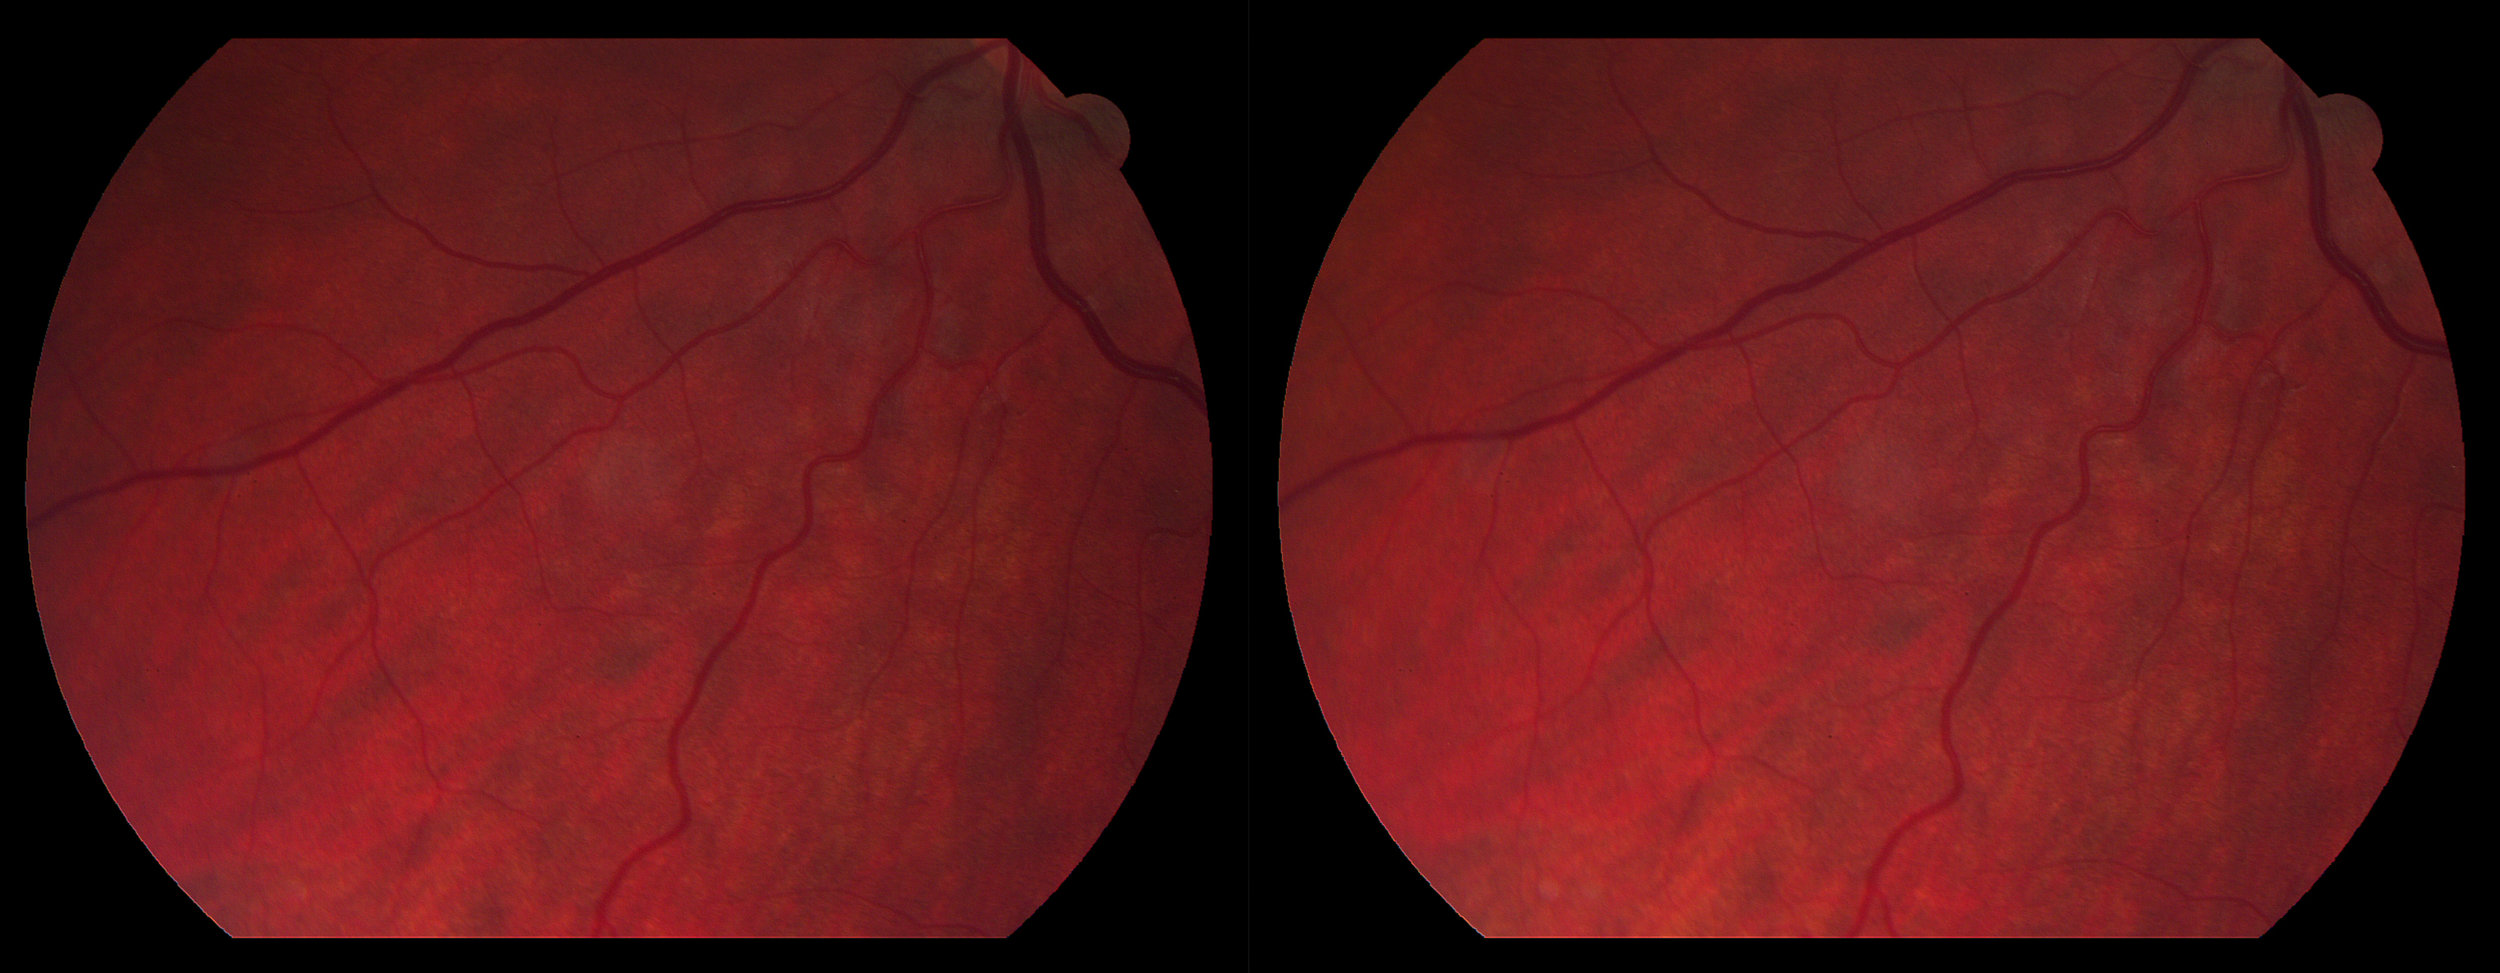 Oculus Sinister: Inferior Nasal